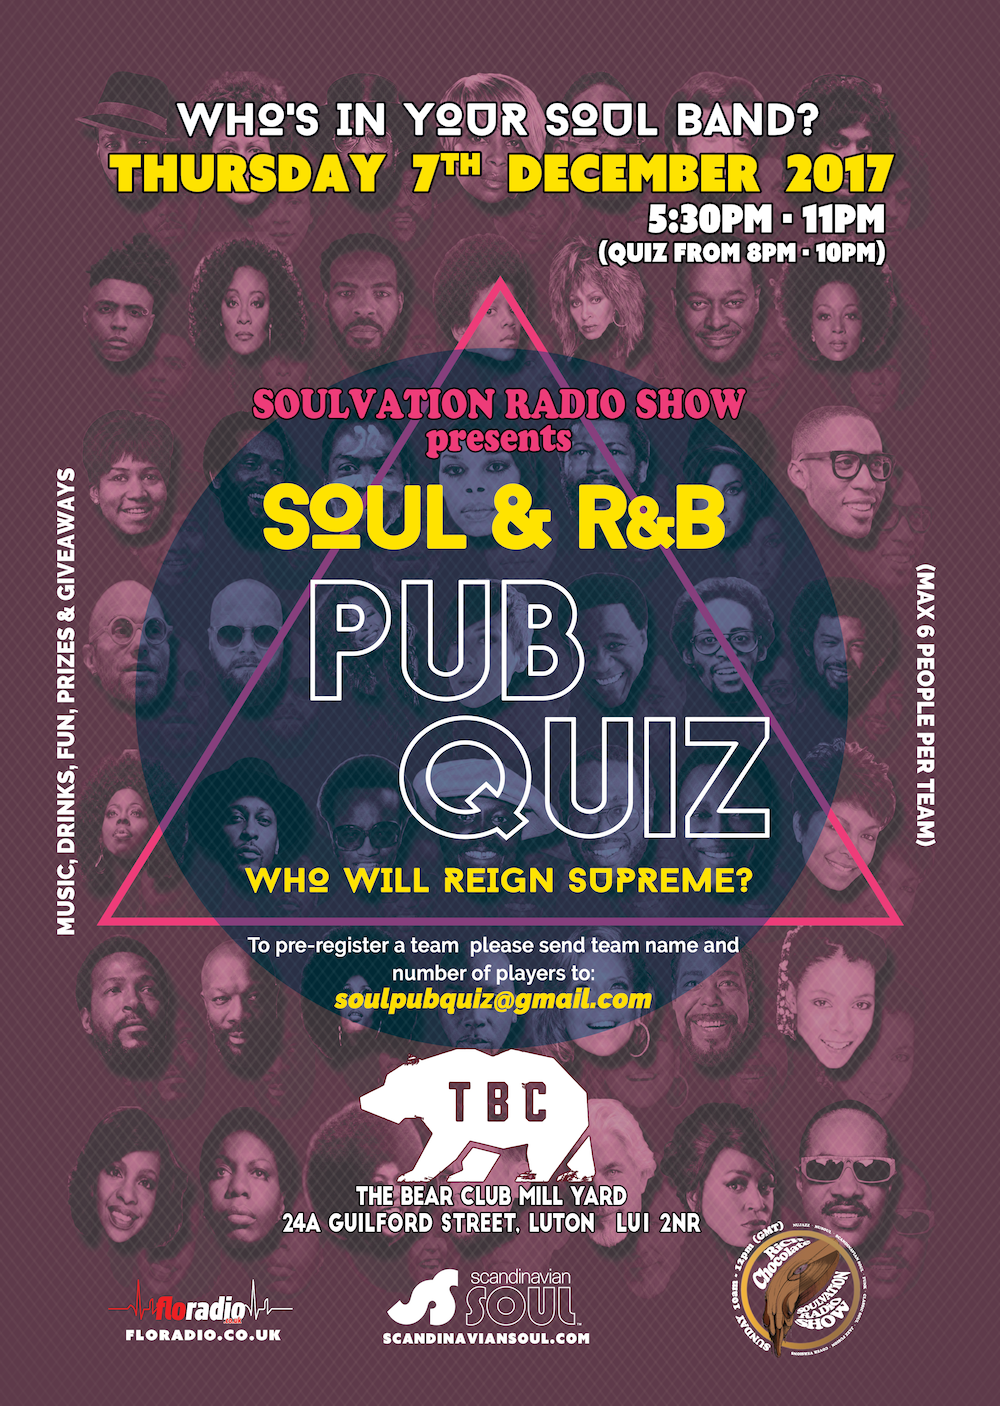 Soul-&-RnB-Pub-Quiz-Flyer-(DECEMBER).png